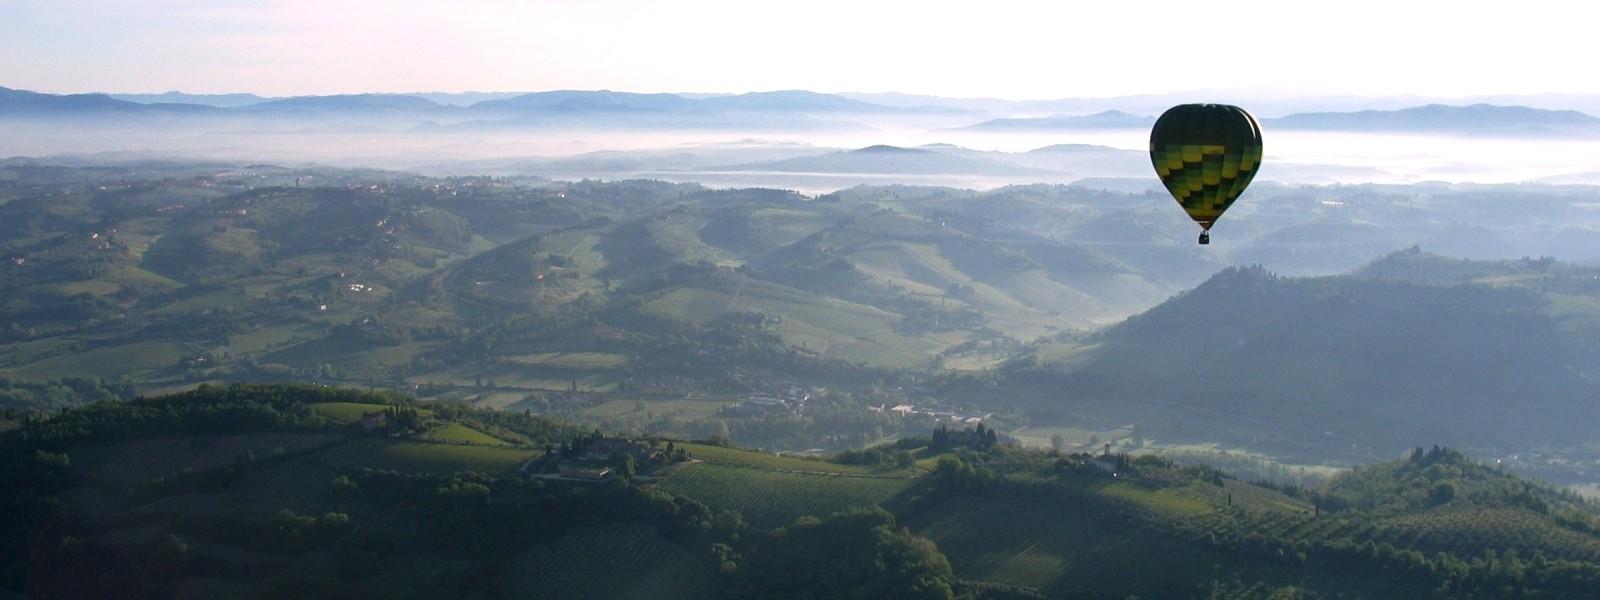 Hotair ballooning in Tuscany, Florence, Siena, Italy